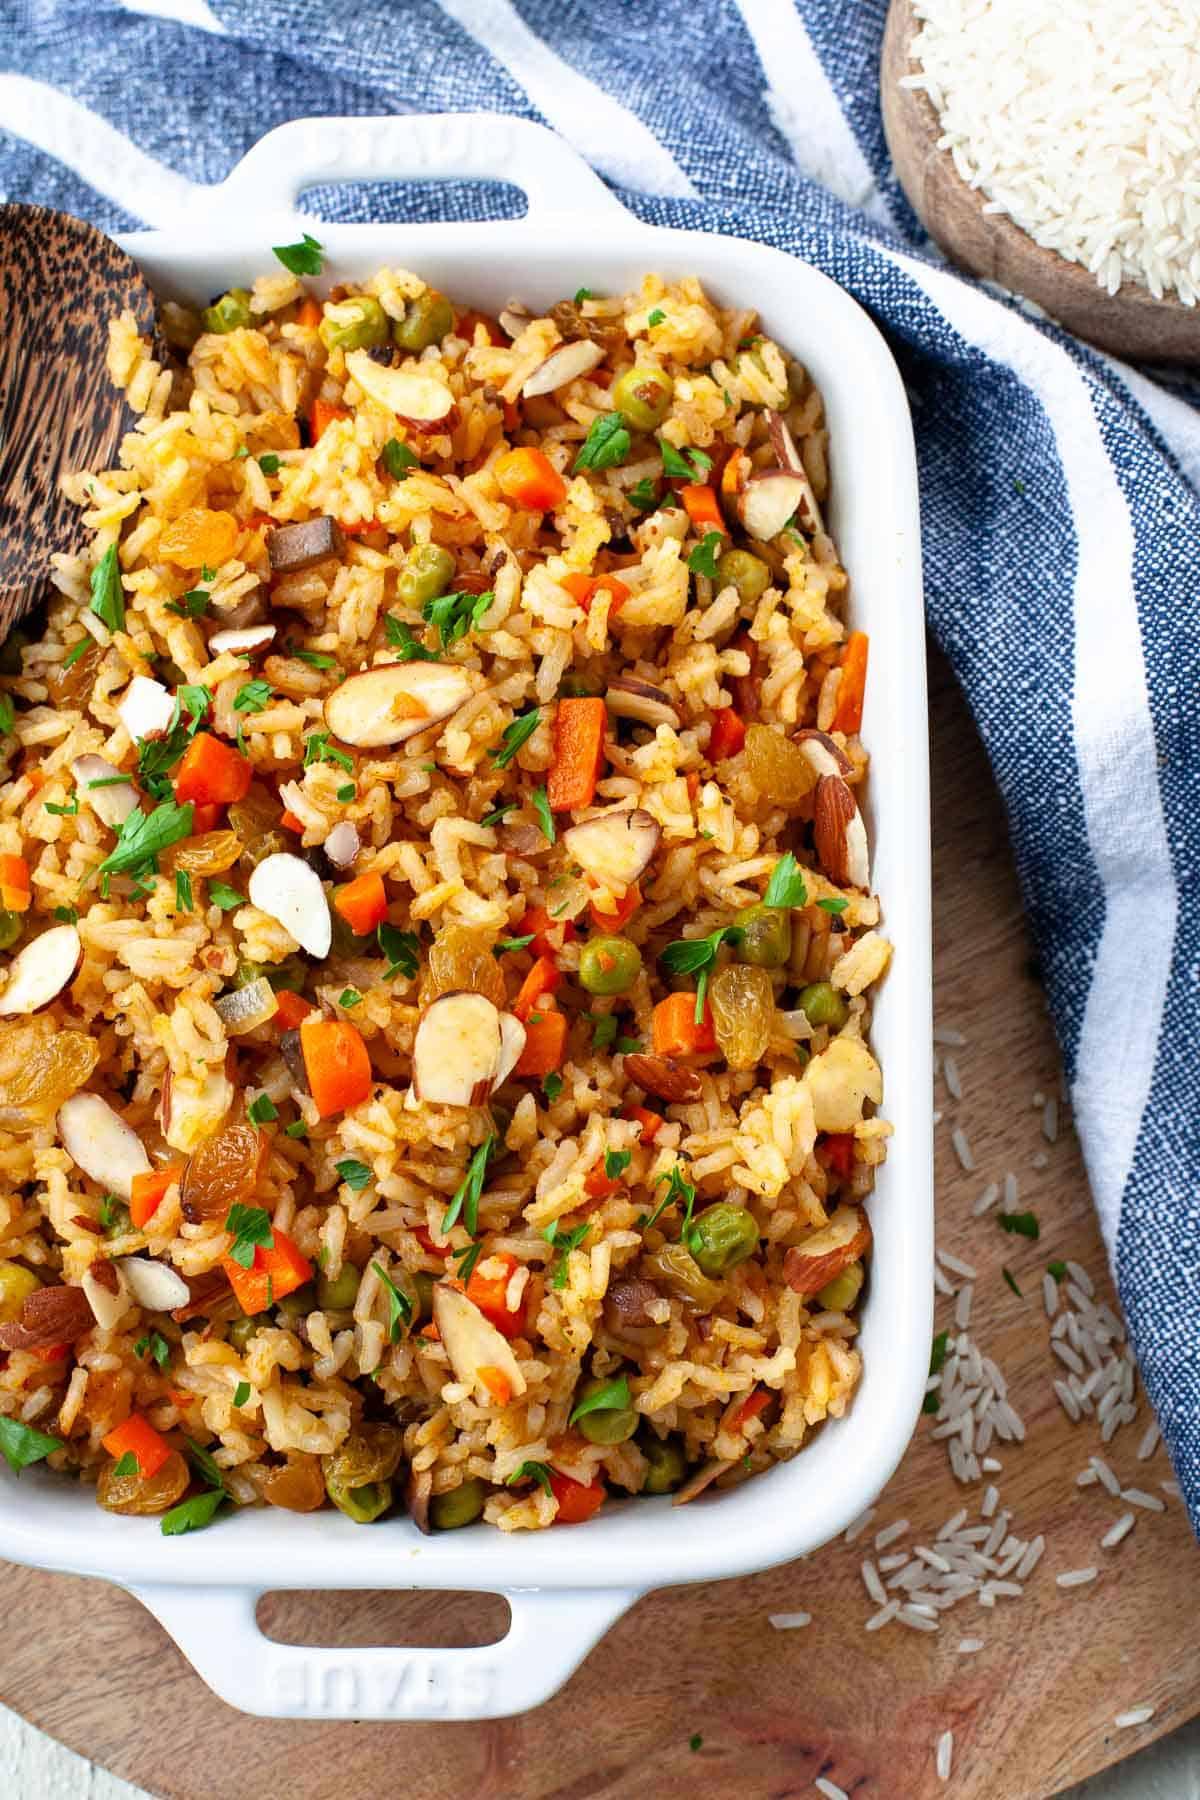 vegetarian rice pilaf in casserole dish with long grain white rice, sliced almonds, golden raisins